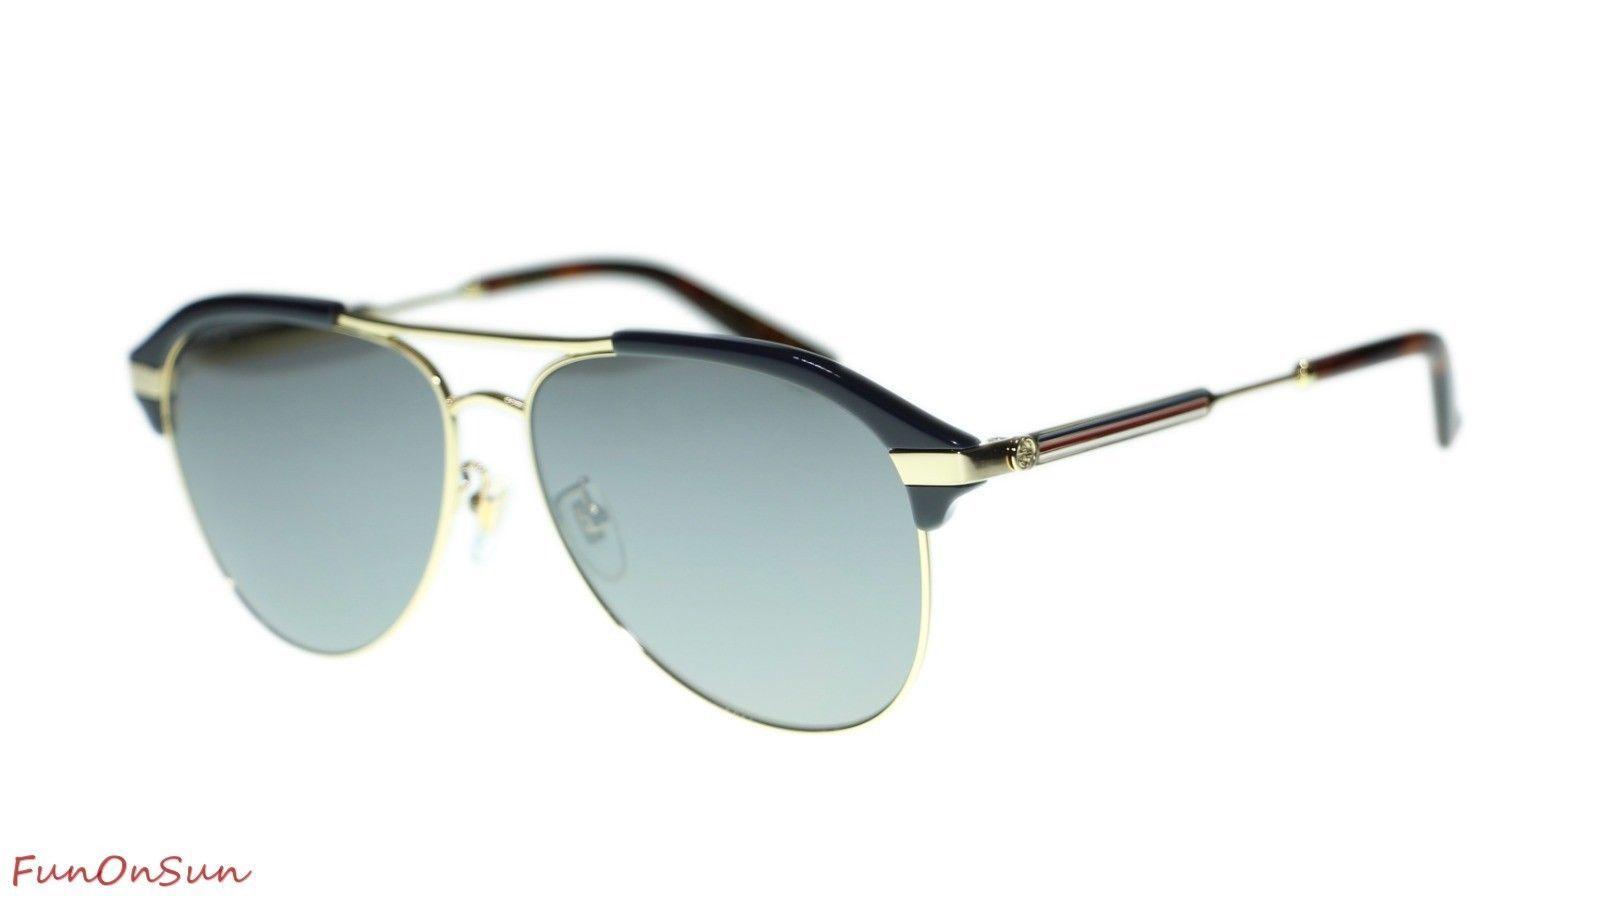 a36f936db28d9 10. 10. Previous. NEW Gucci Men s Sunglasses GG0288SA 005 Blue Gold Silver  Mirror Lens Pilot 60mm